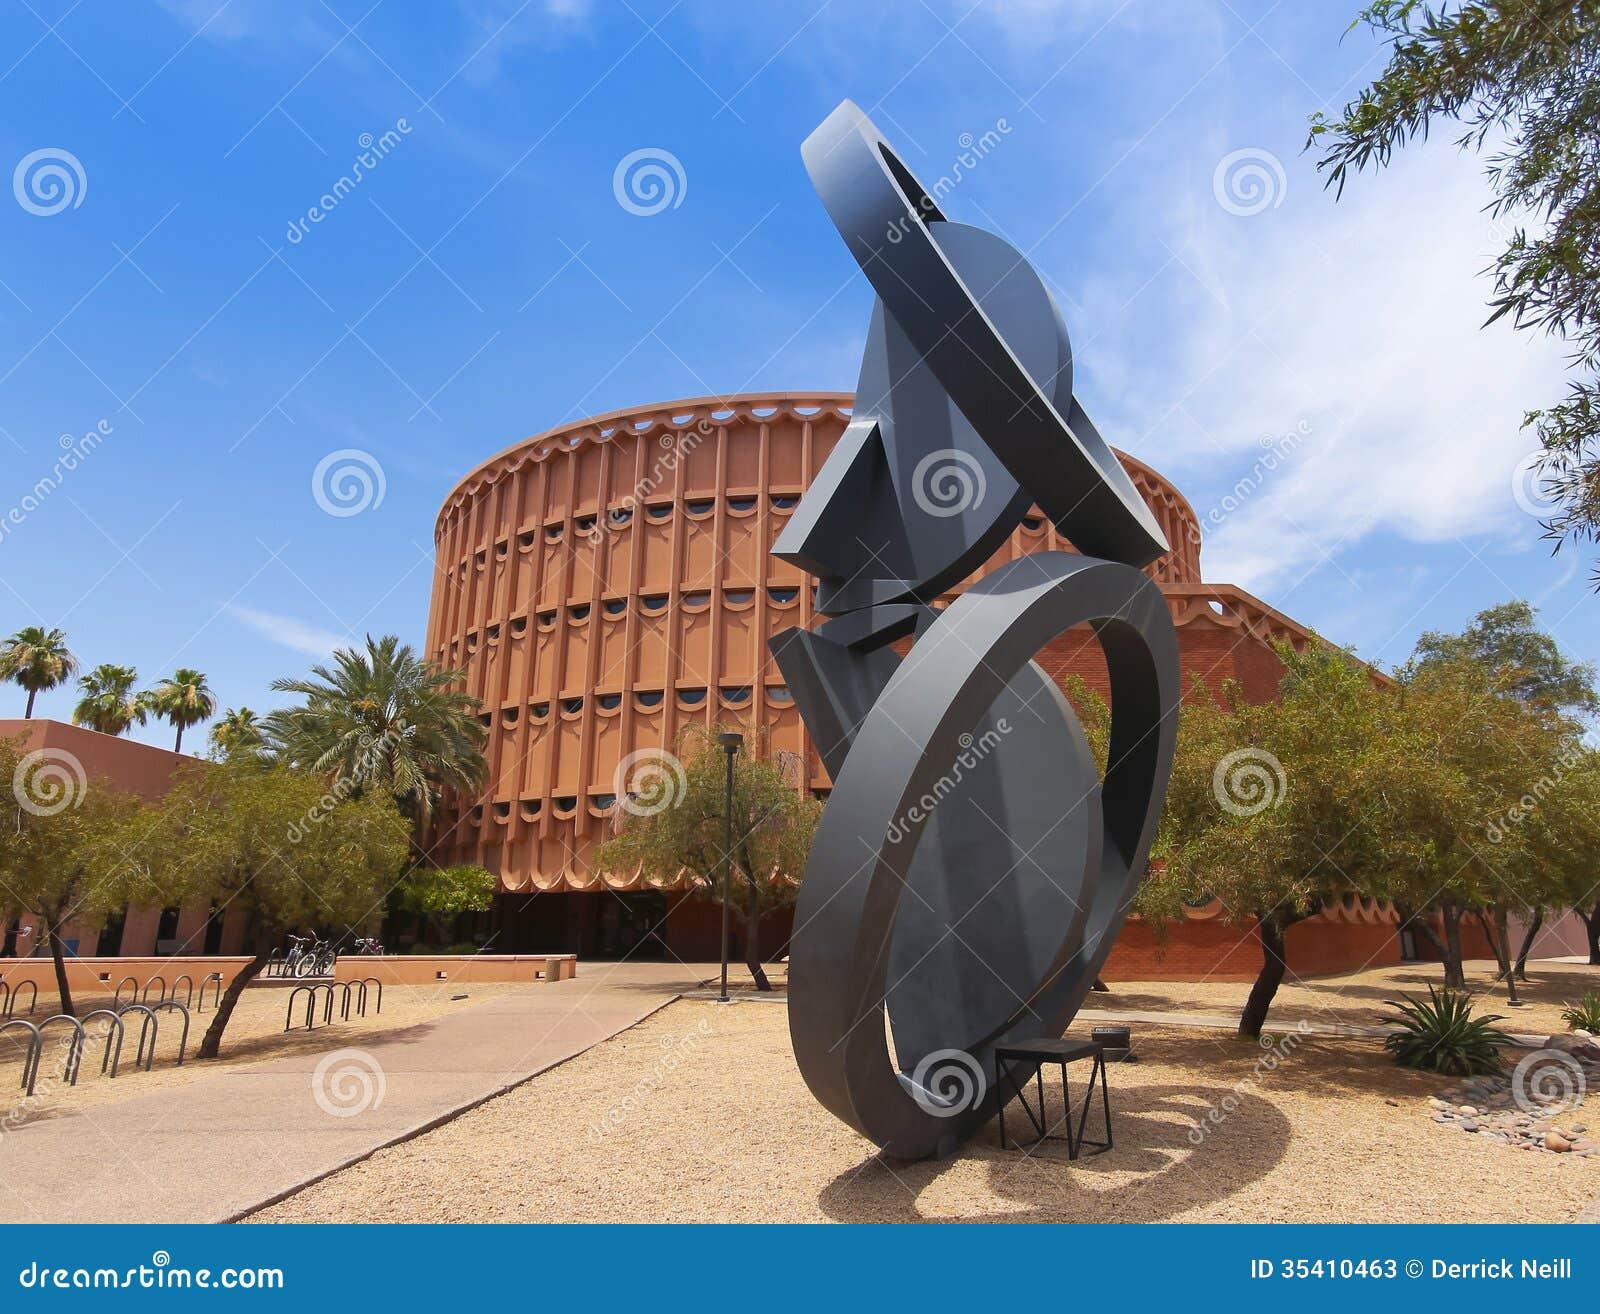 Edificio de la música de la universidad de estado de Arizona, Tempe, Arizona